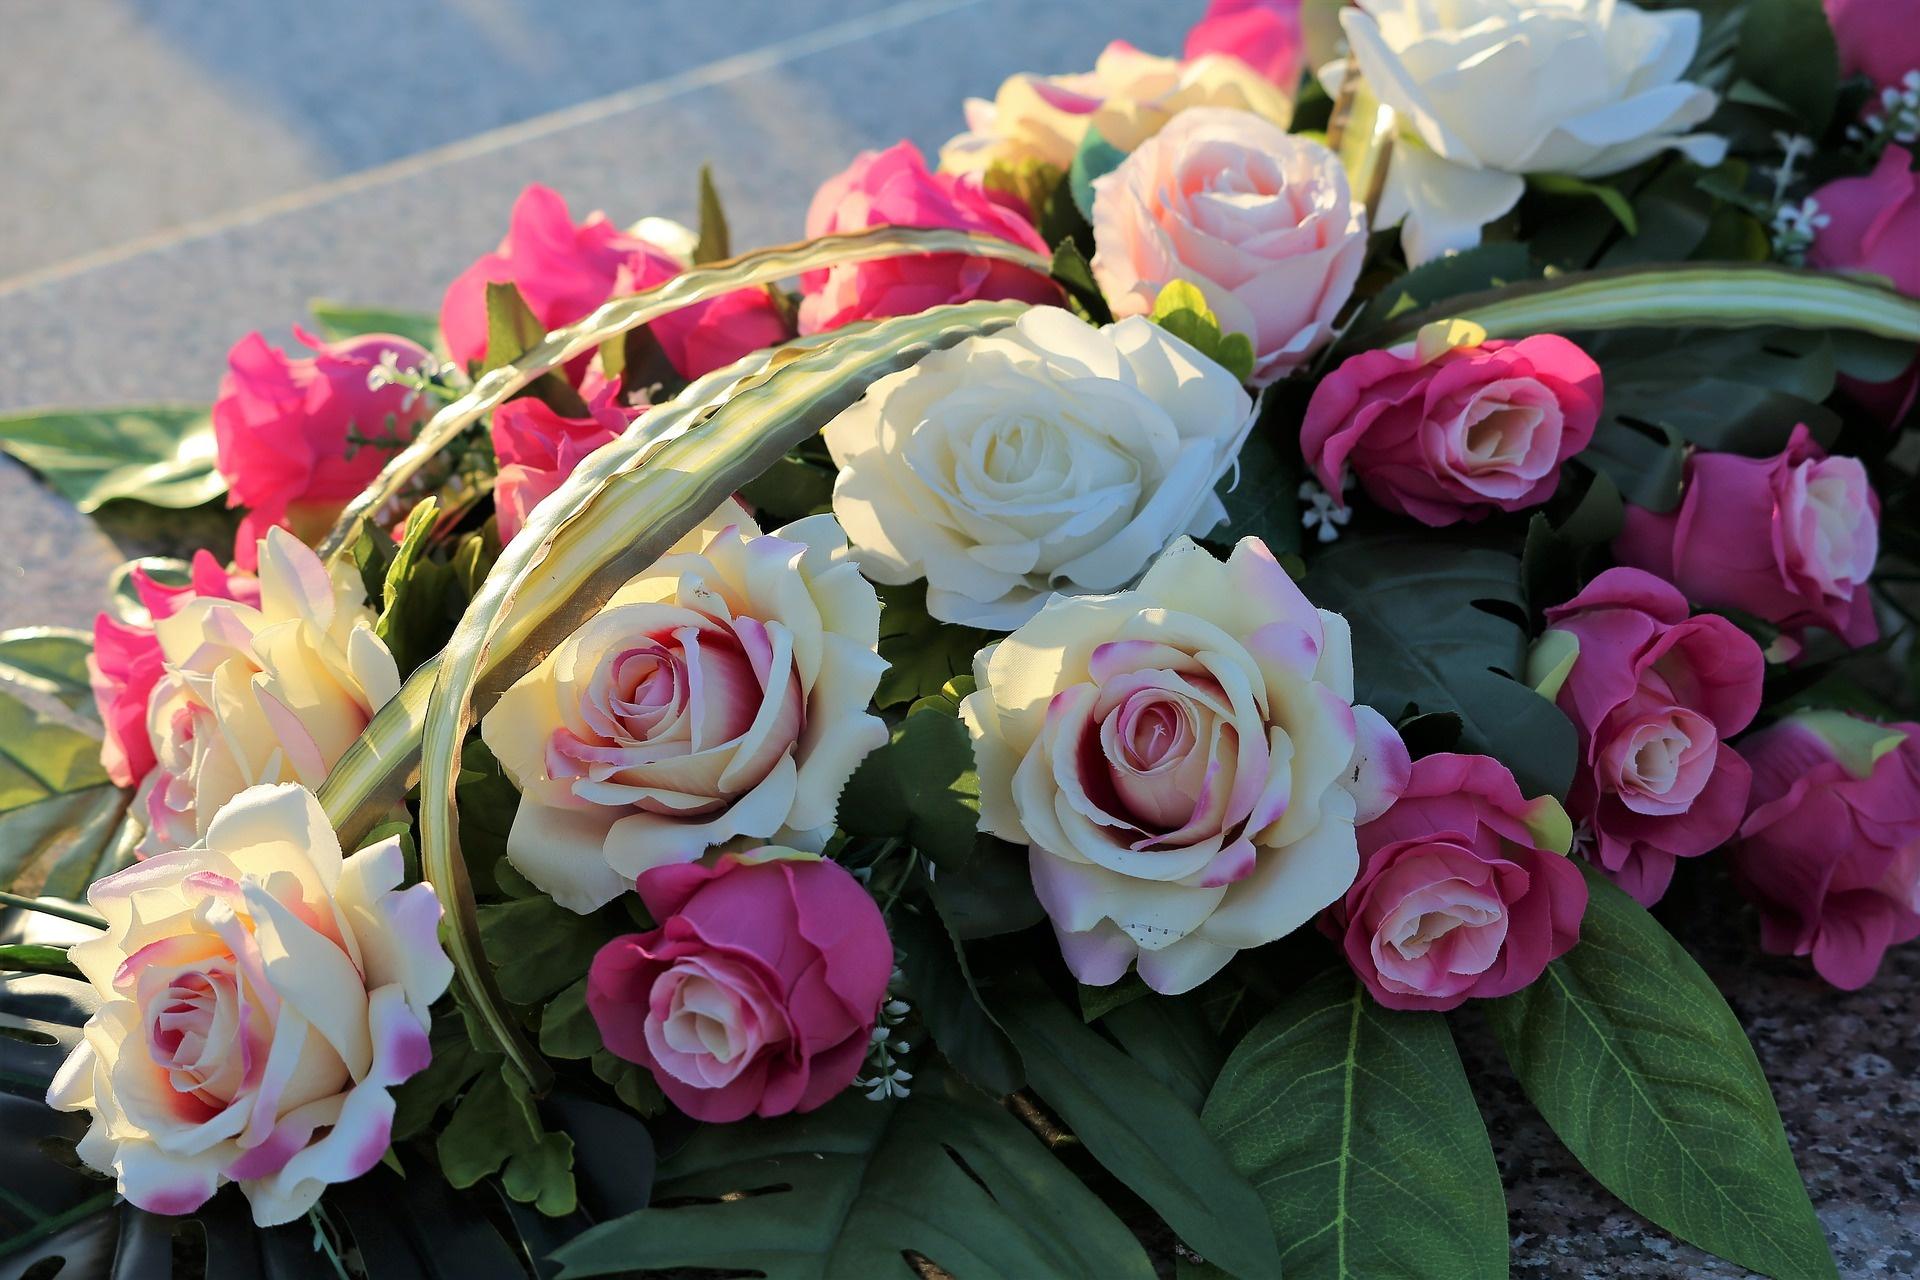 flores funerarias entierros cementerios coronas de flores sepelios